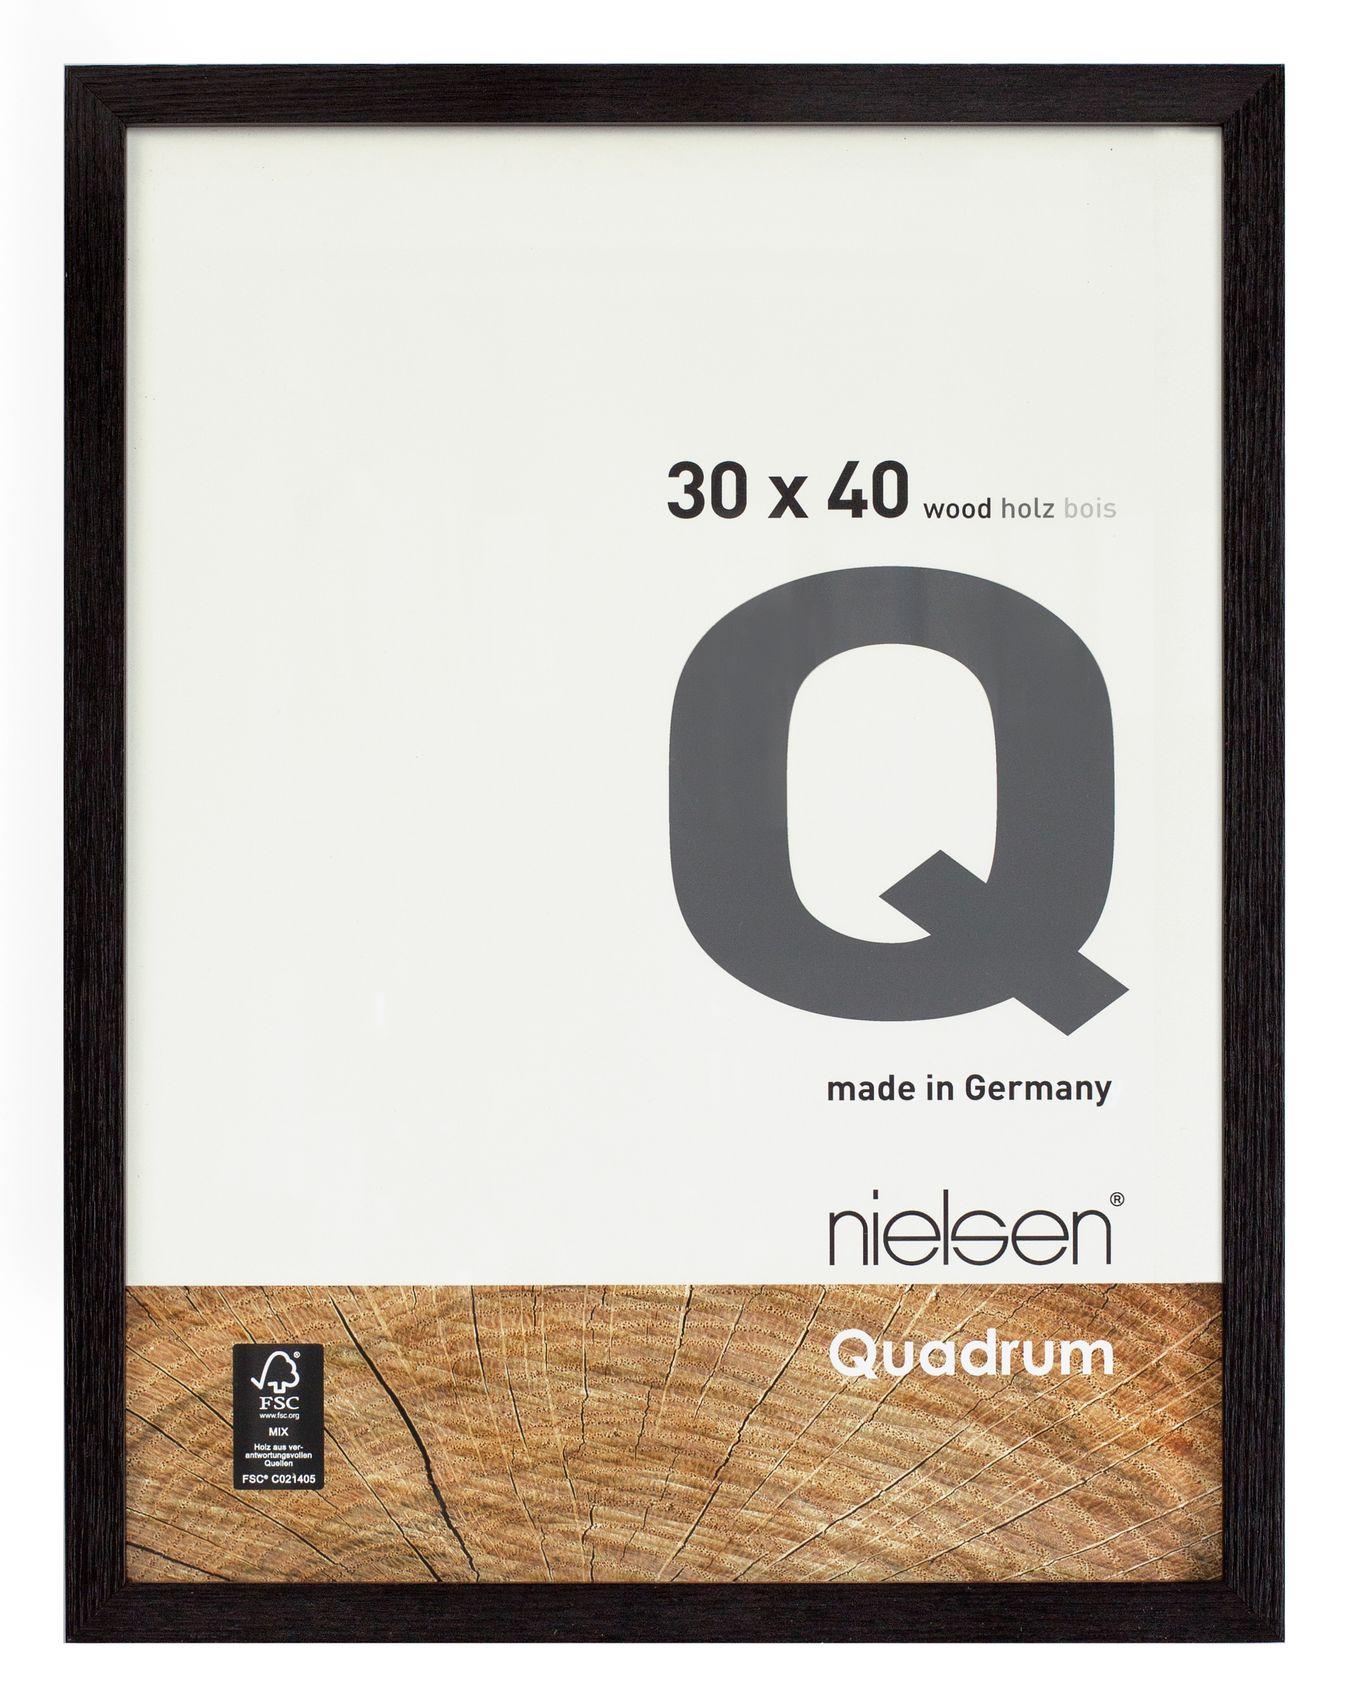 Nielsen Quadrum 30x40 Veneer Jet Wood Picture Frame The Artch